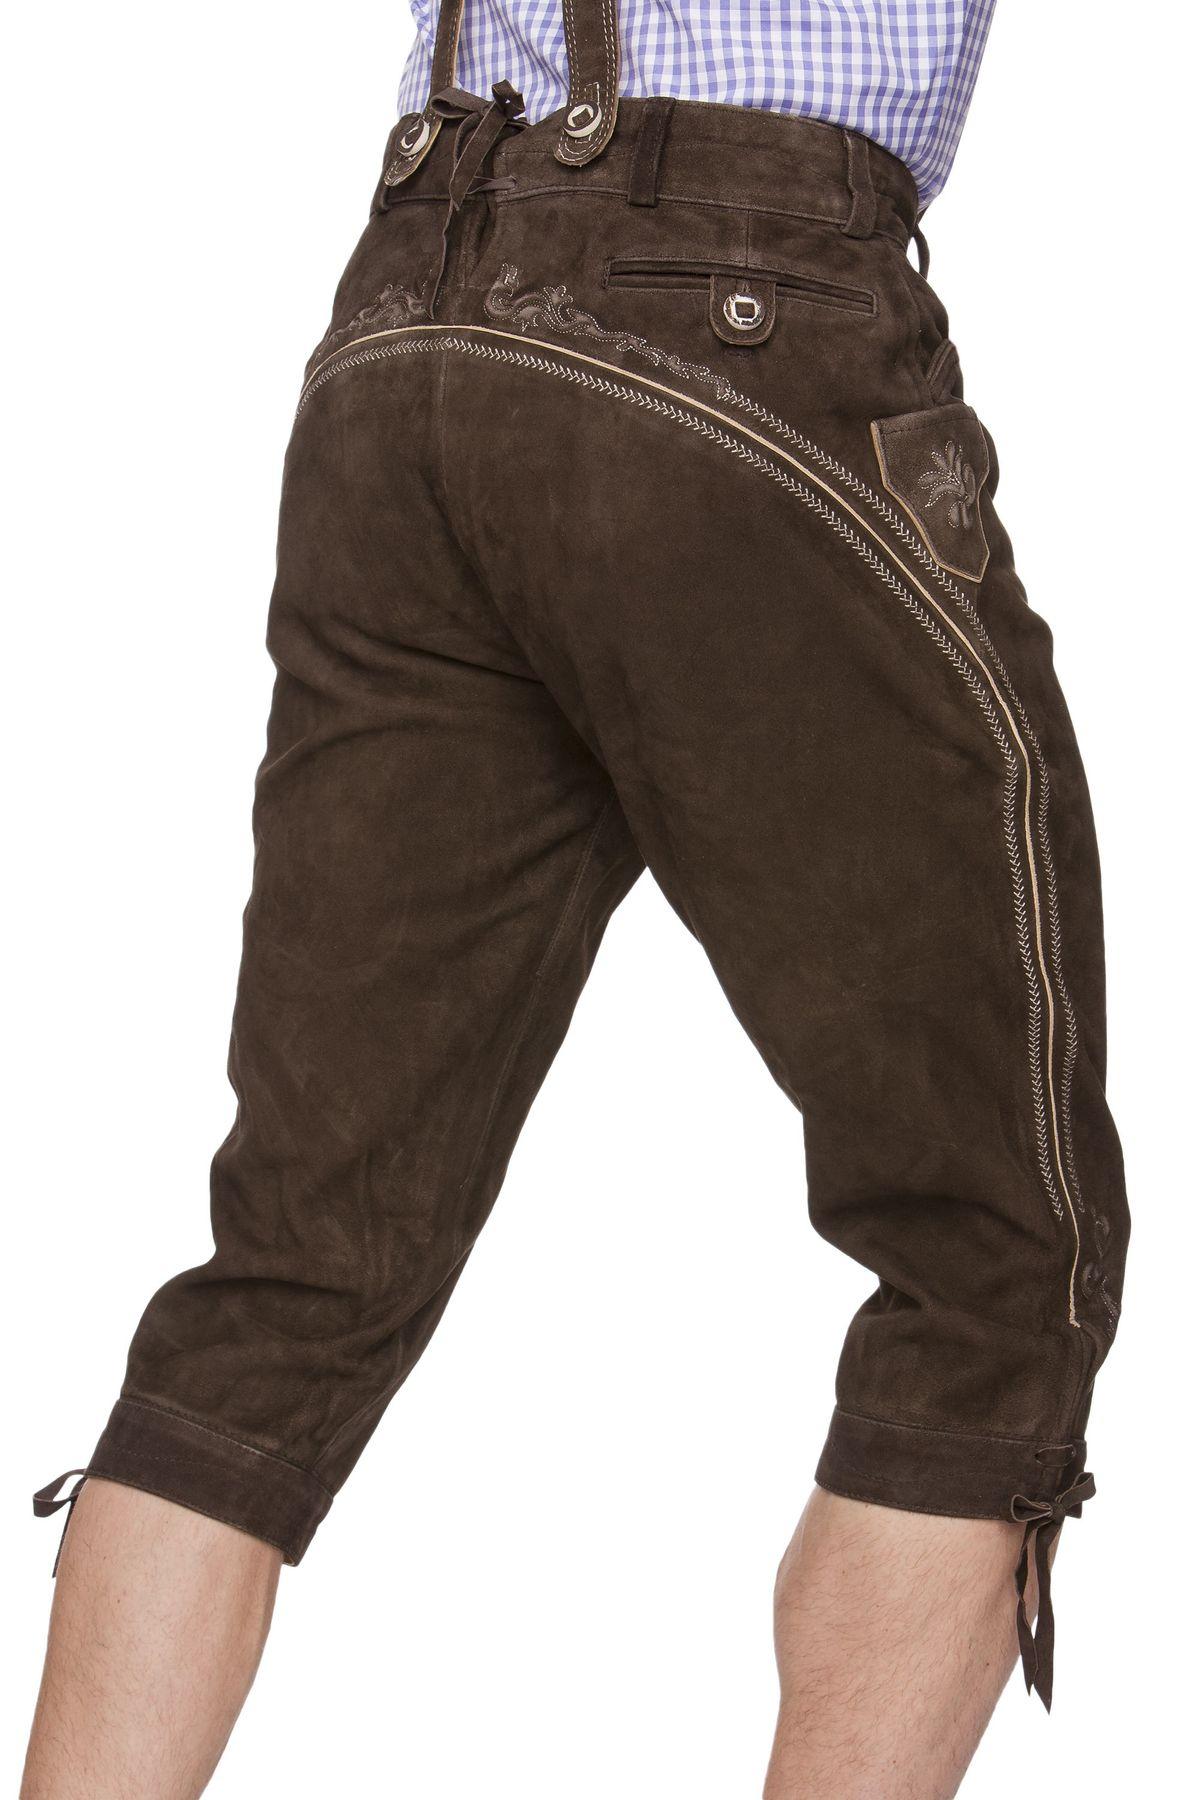 Stockerpoint - Herren Trachten Lederhose, Art. Justin2 – Bild 7